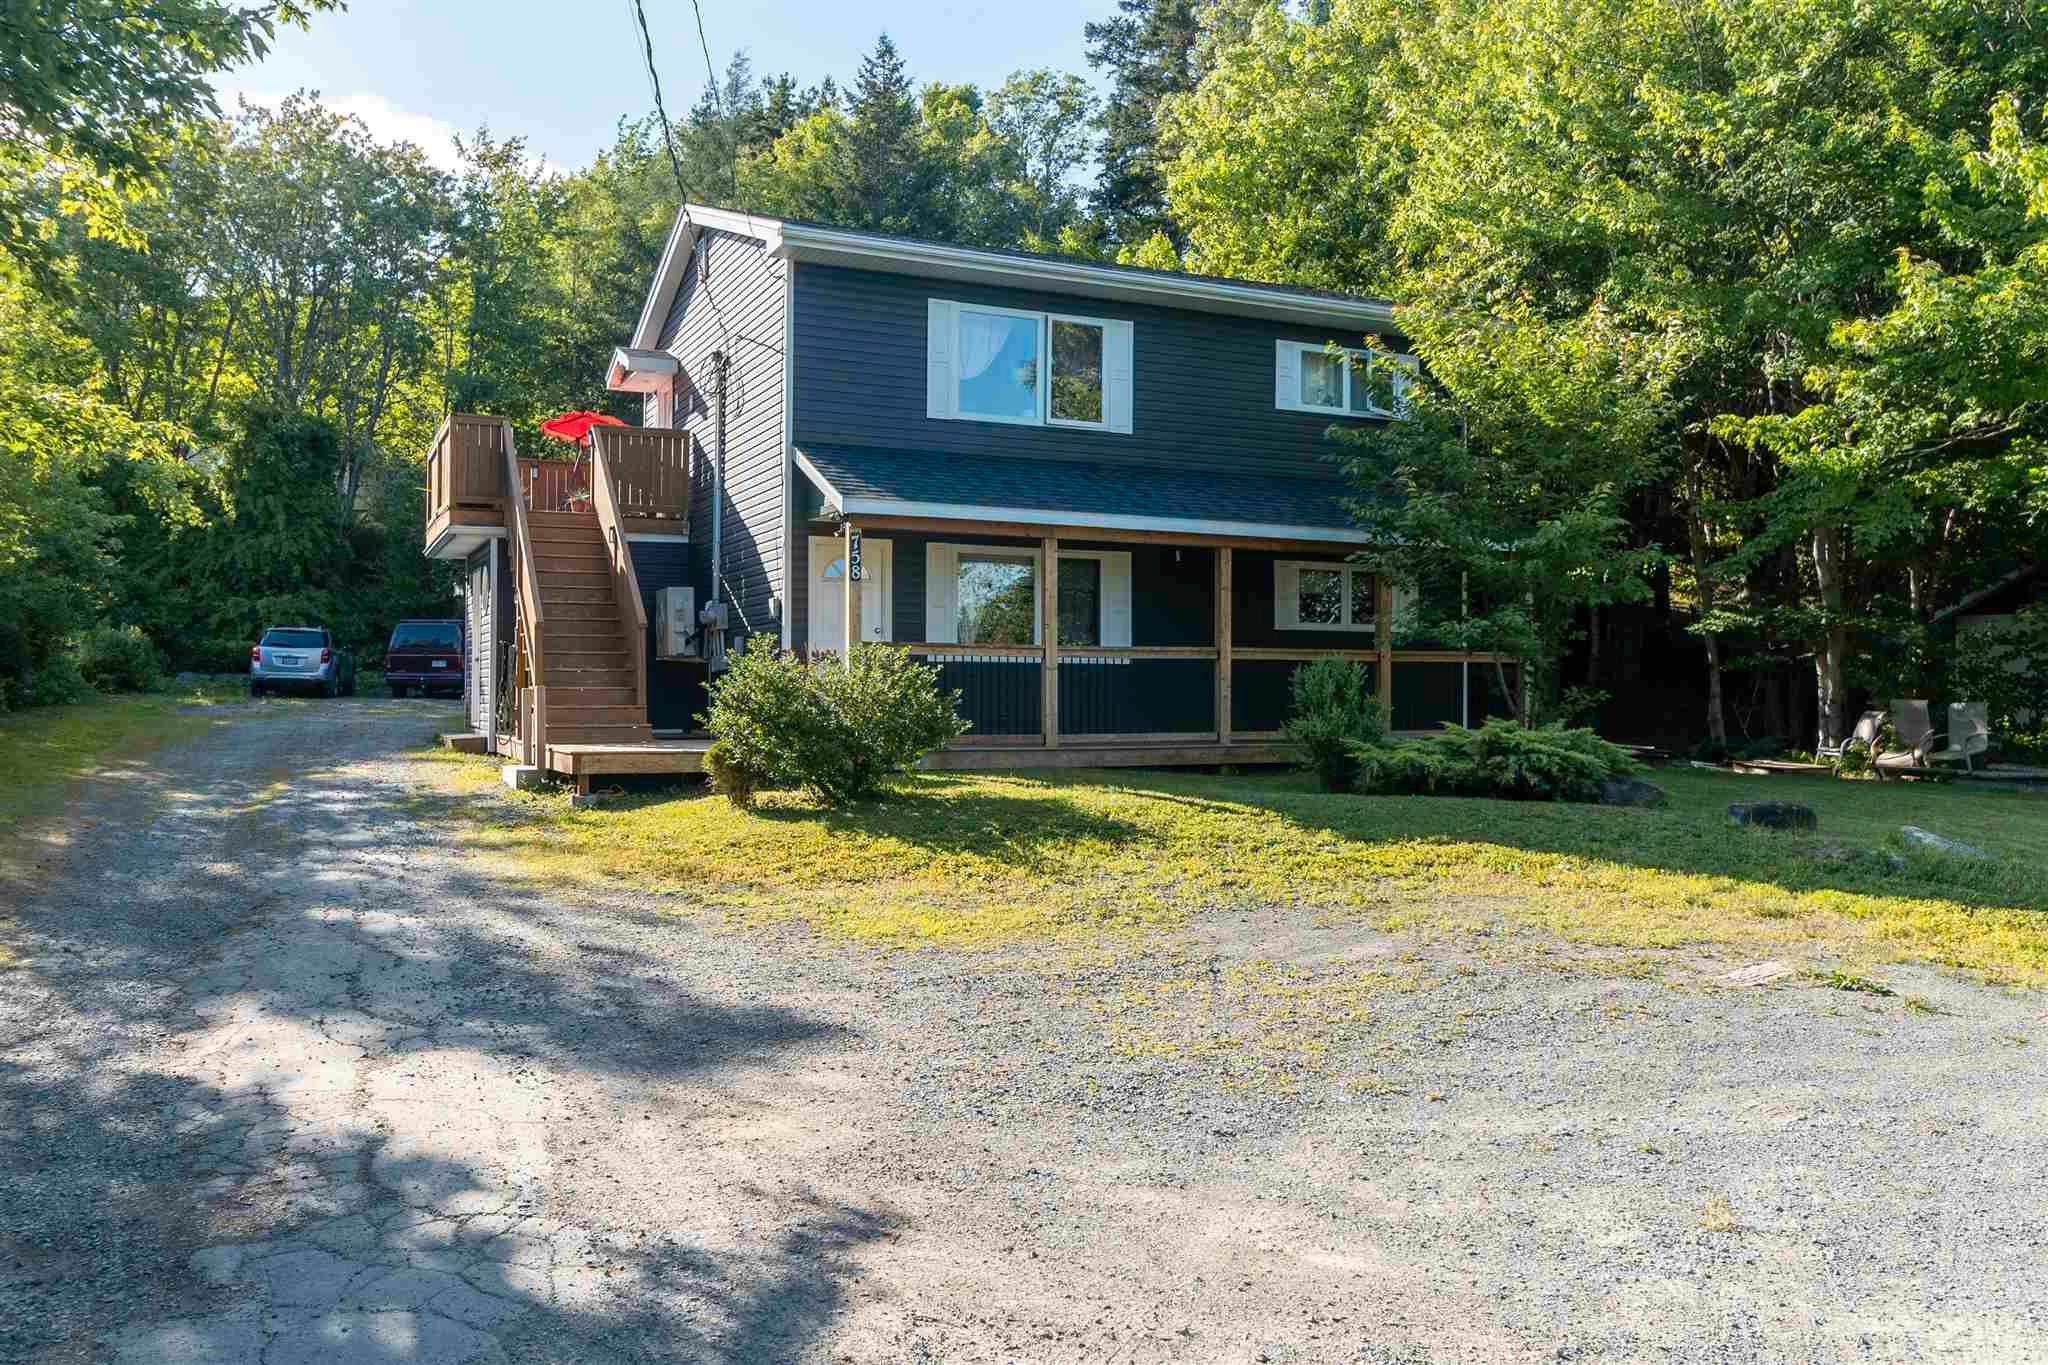 Main Photo: 758 Beaver Bank Road in Beaver Bank: 26-Beaverbank, Upper Sackville Multi-Family for sale (Halifax-Dartmouth)  : MLS®# 202118333